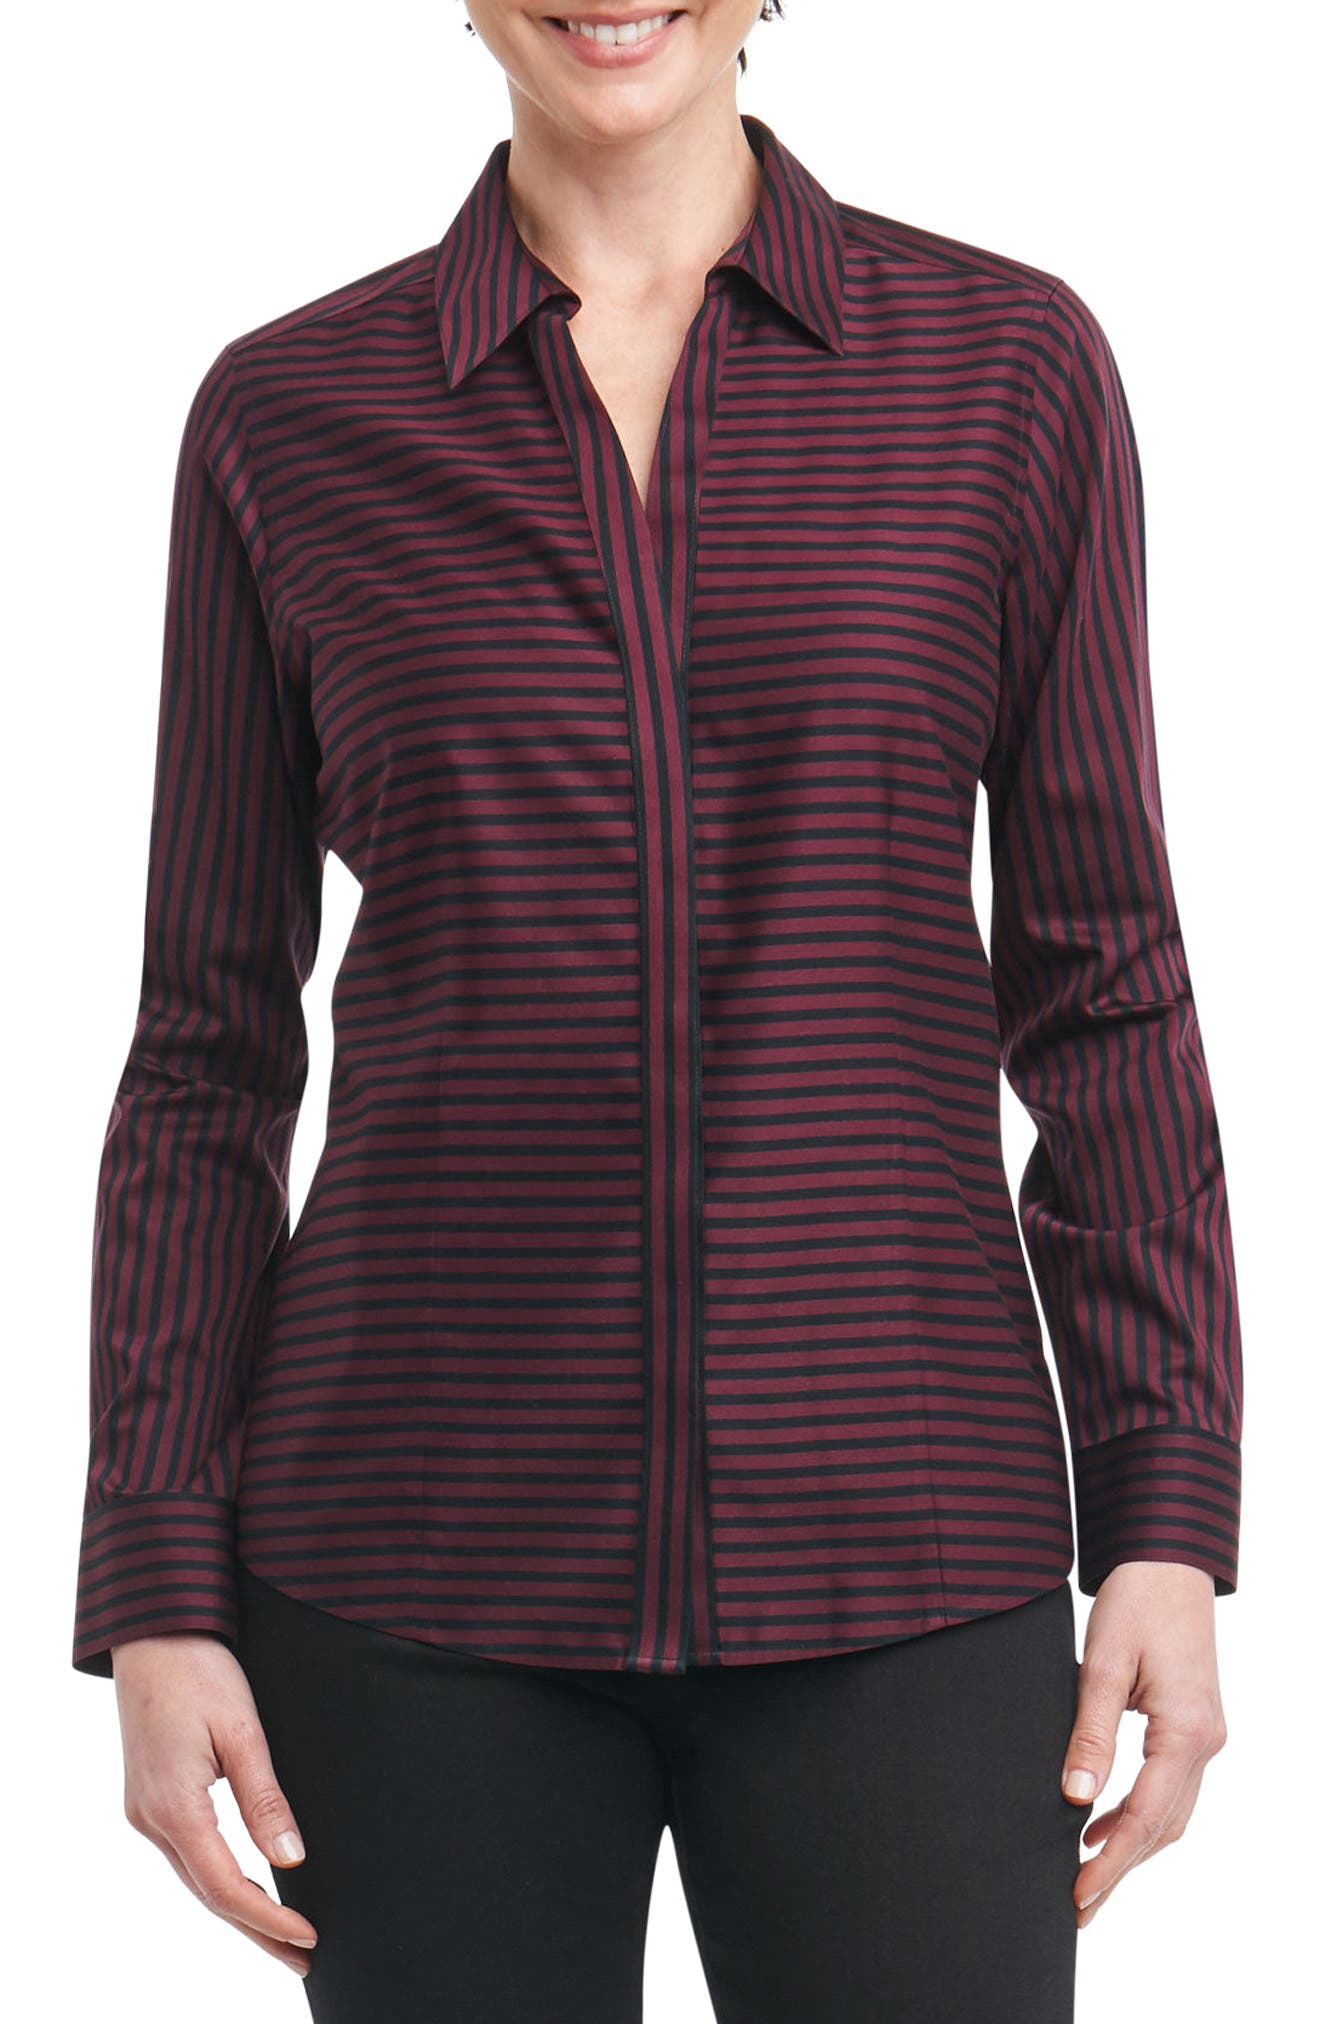 Ellen Non-Iron Stripe Sateen Shirt,                             Main thumbnail 1, color,                             936